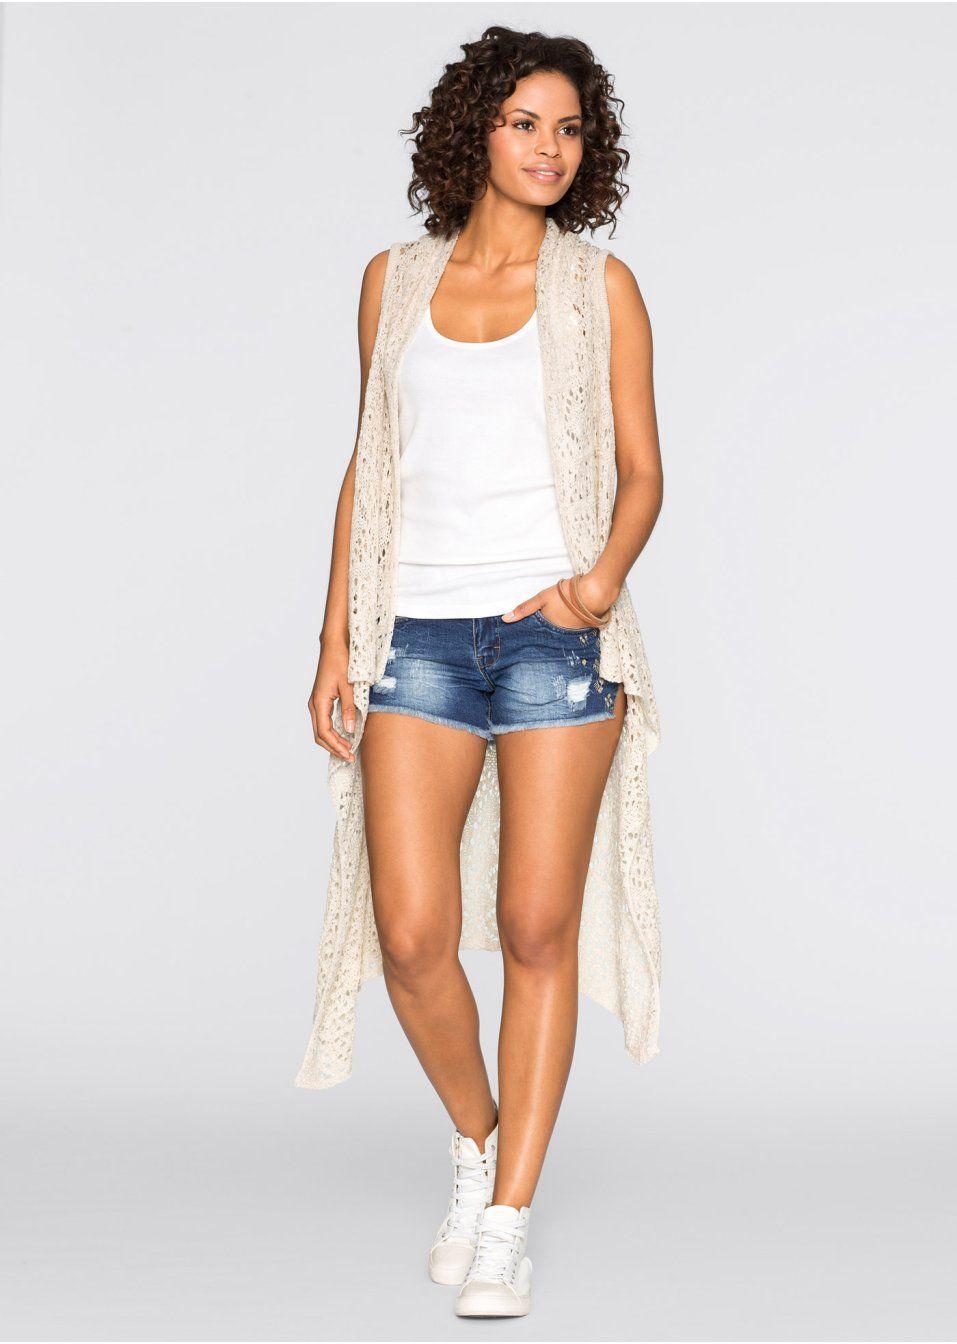 Pletená vesta S asymetrickým strihom • 9.99 € • bonprix